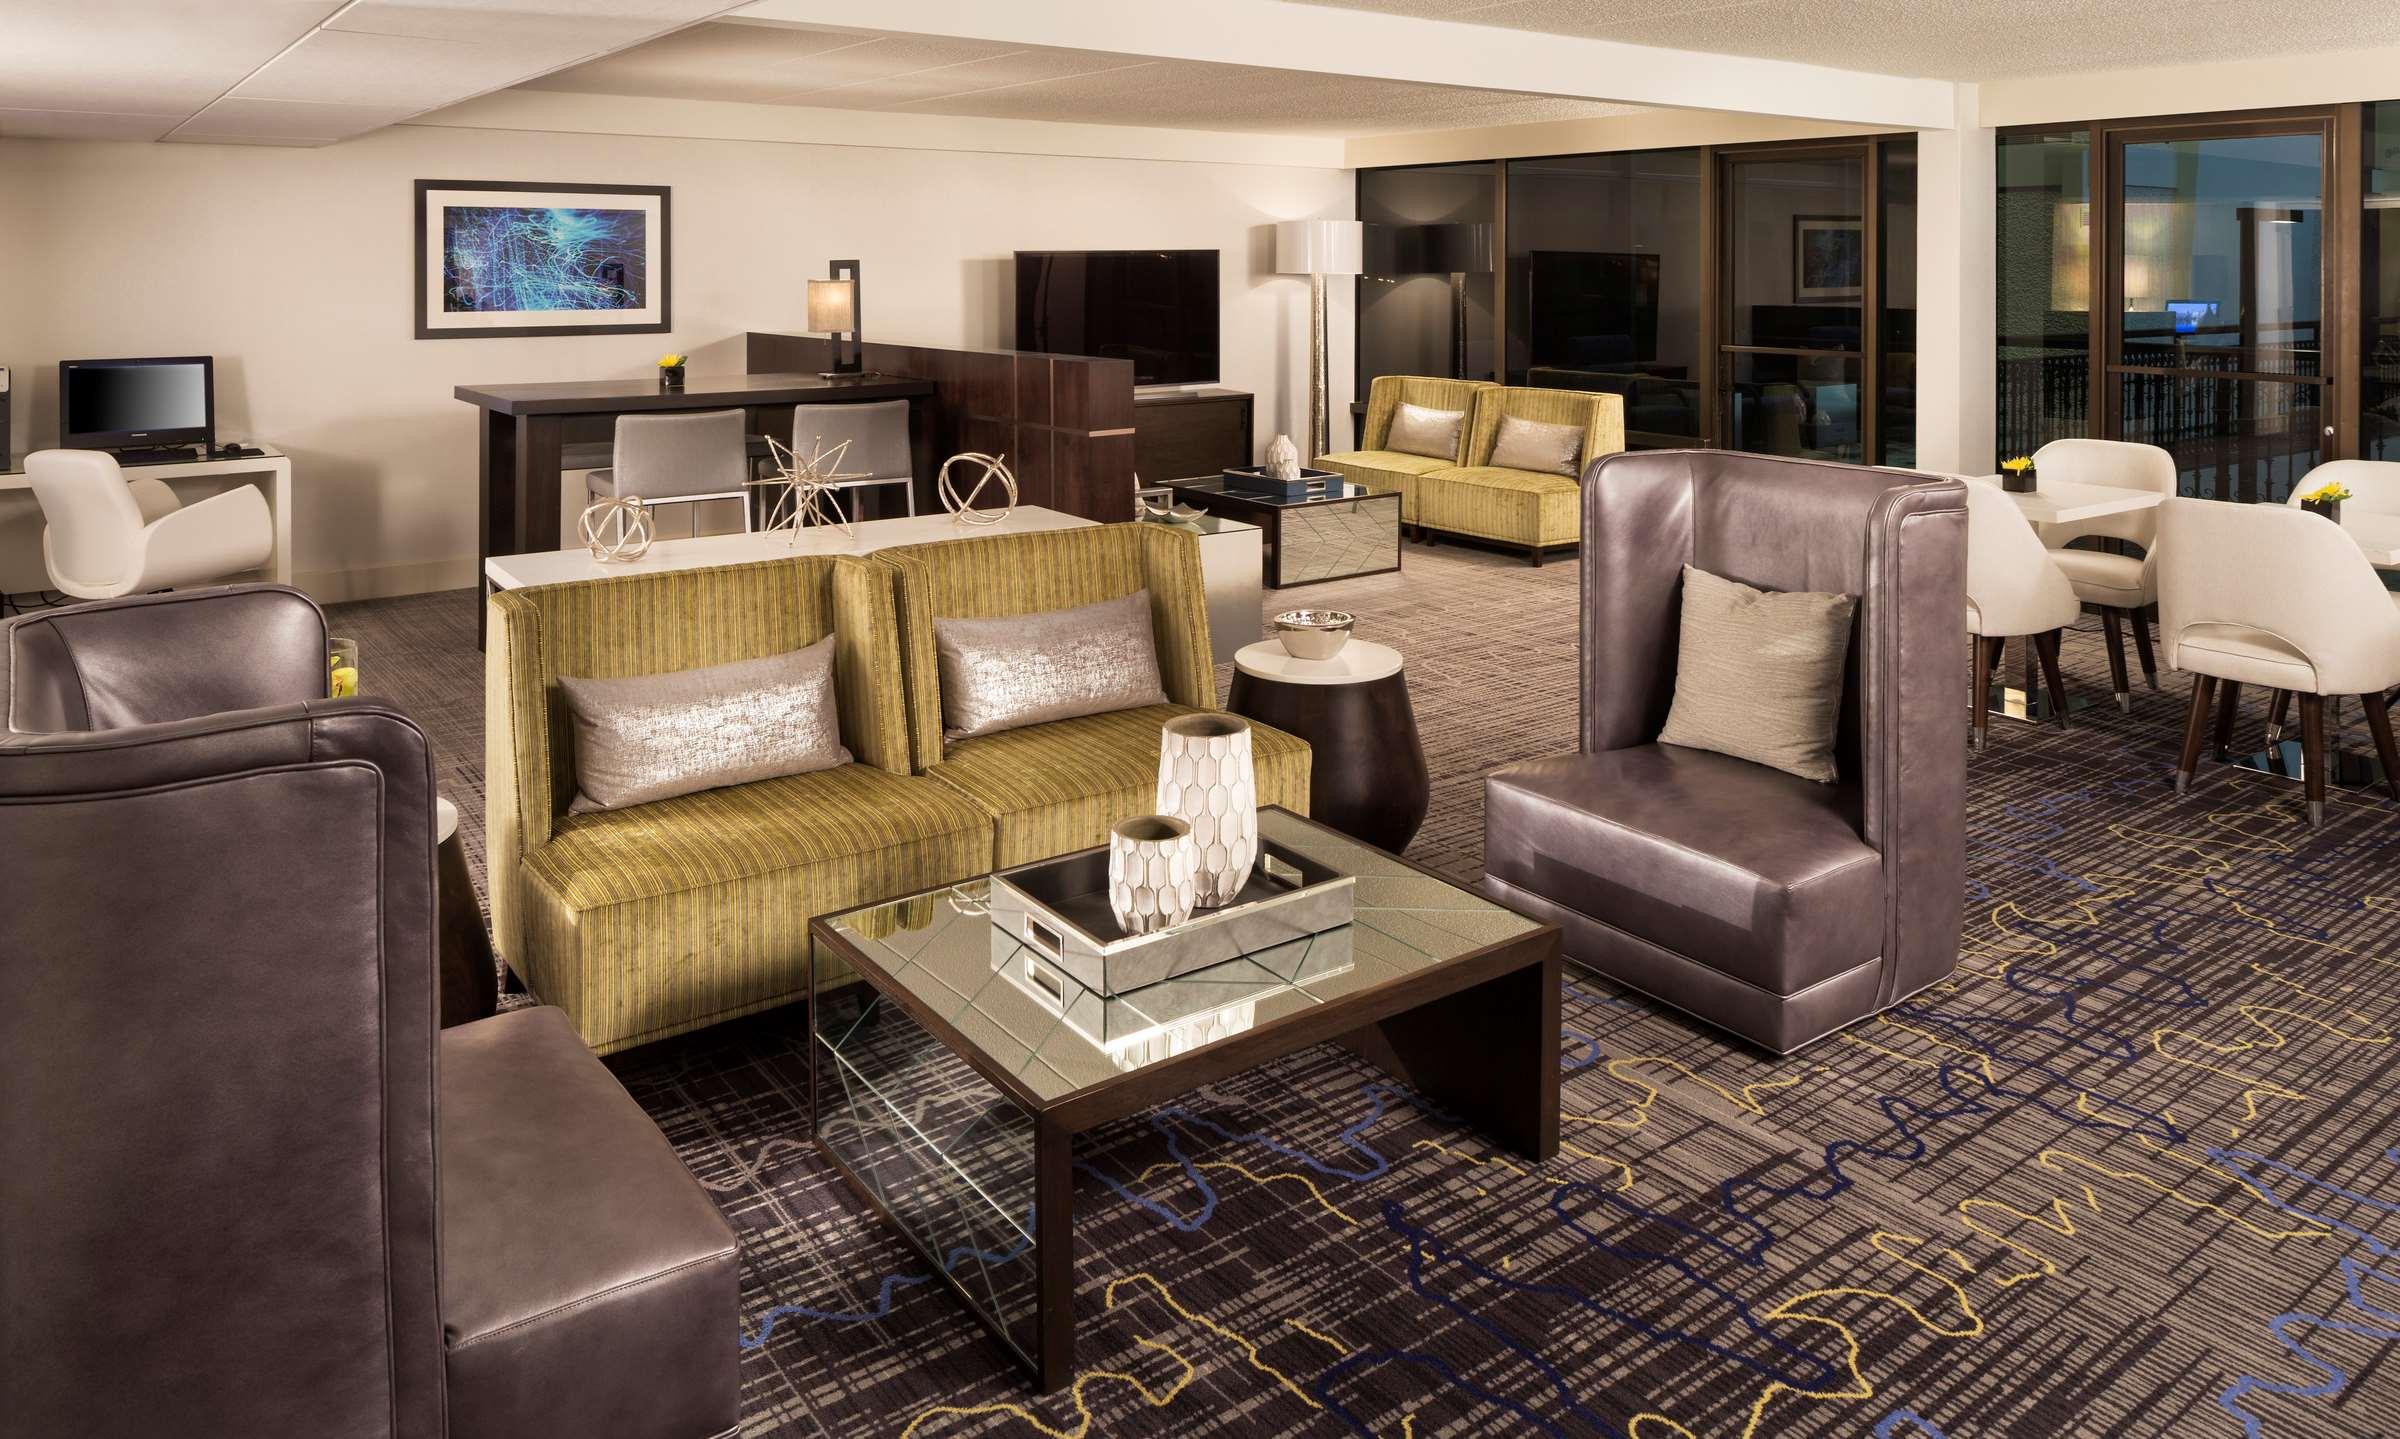 Sheraton Bloomington Hotel image 32